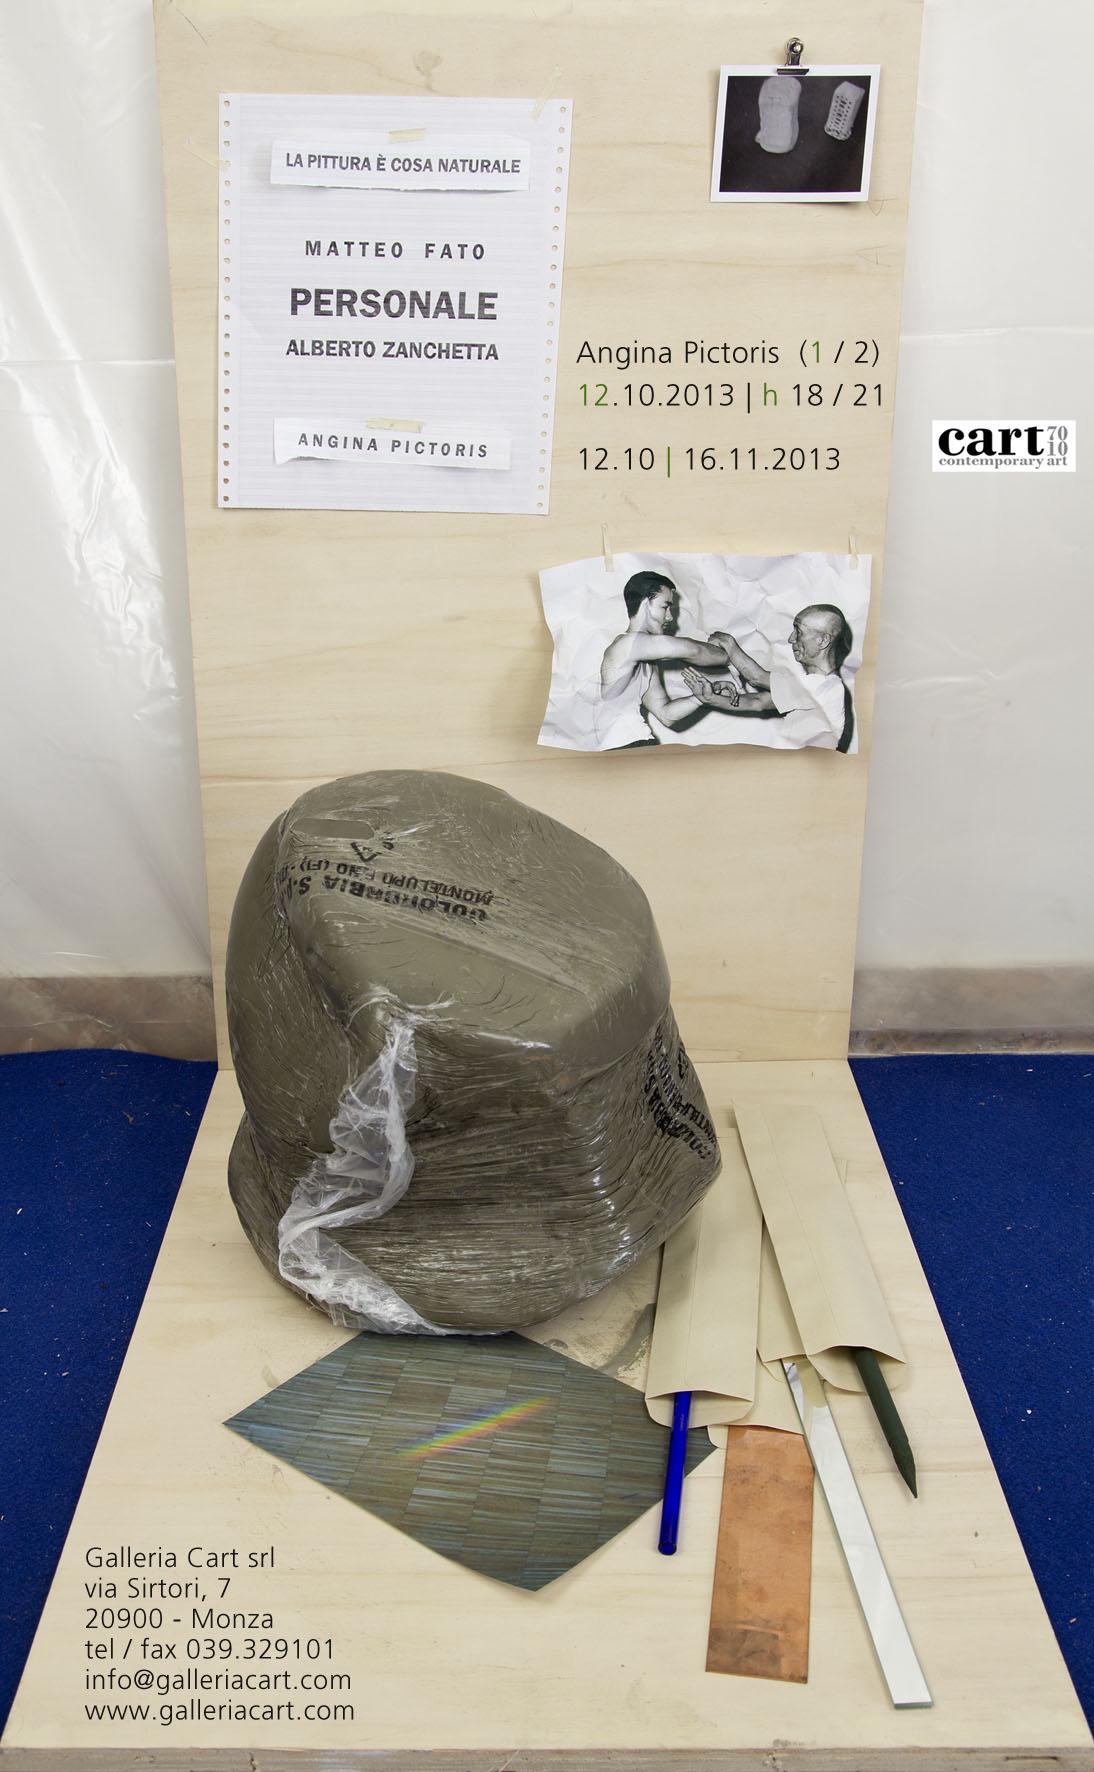 PERSONALE - Angina Pictoris, Galleria Cart, Monza